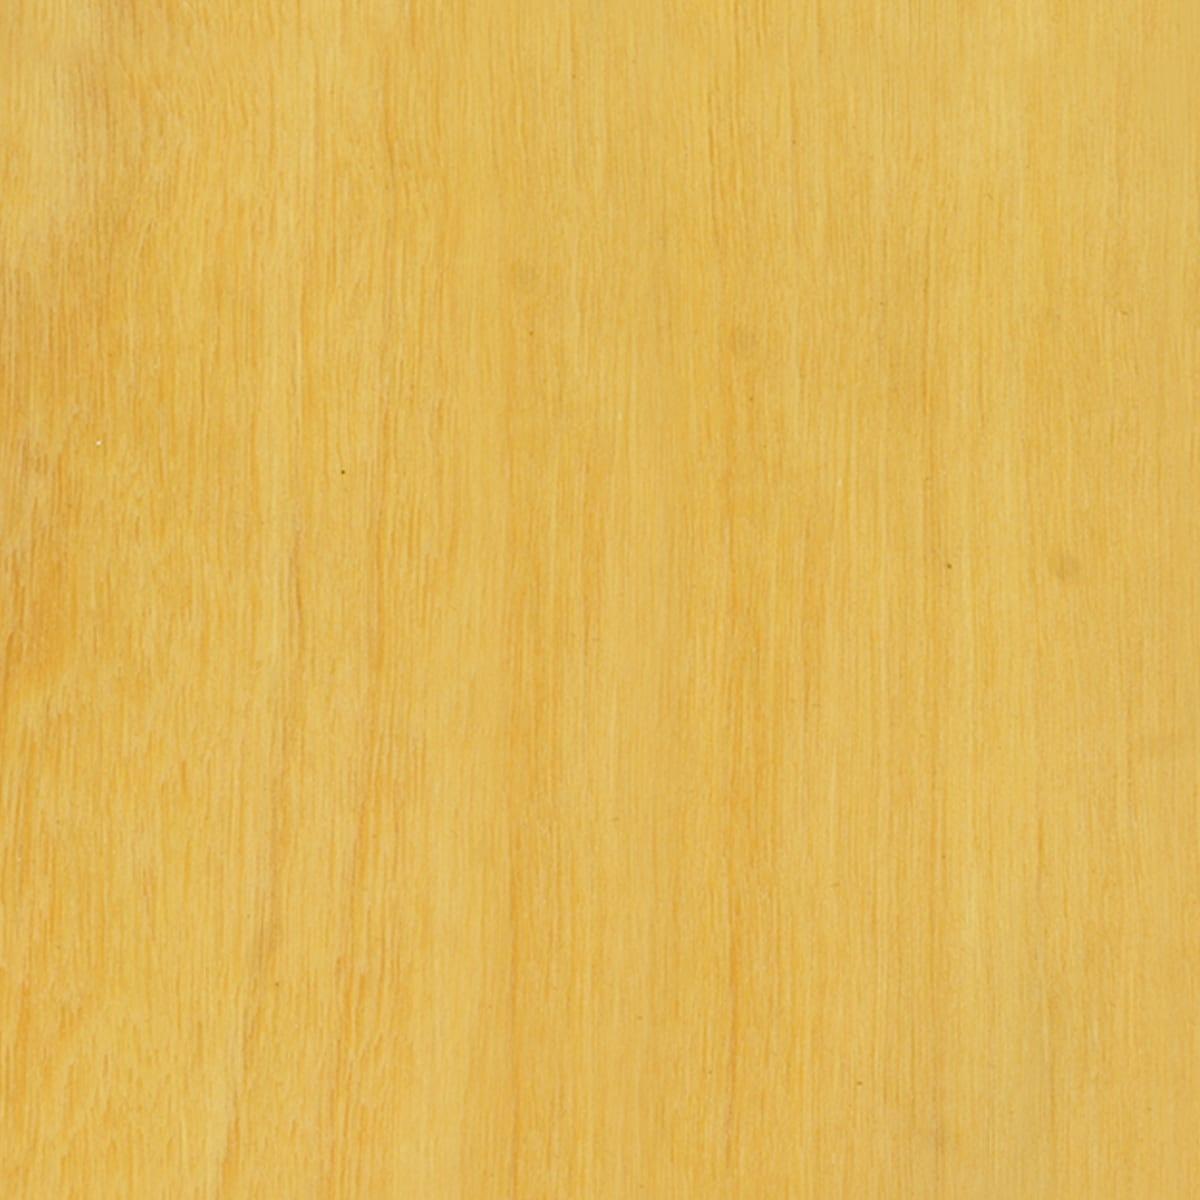 satin wood